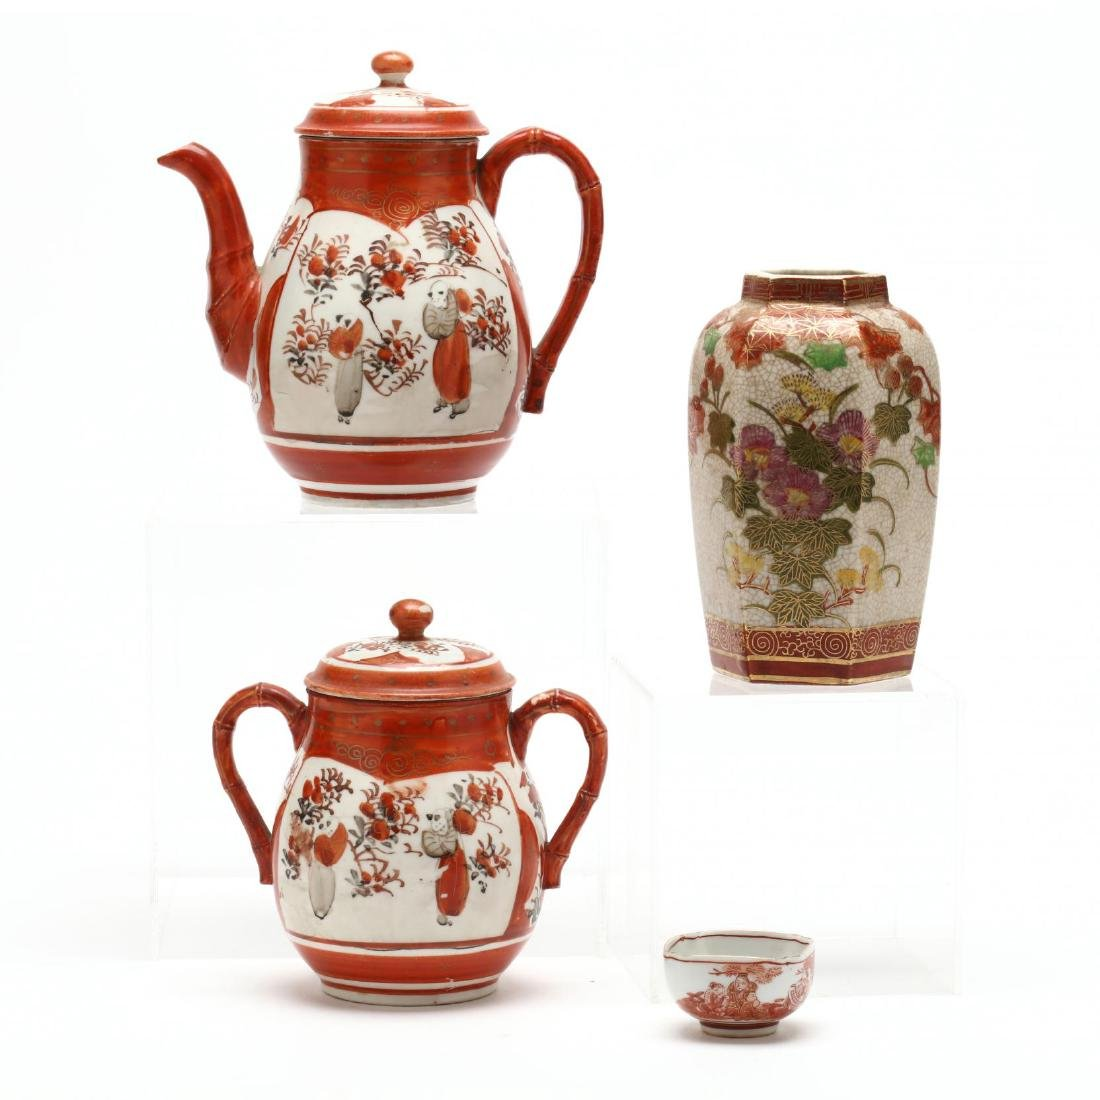 A Group of Japanese Kutani Porcelain Items